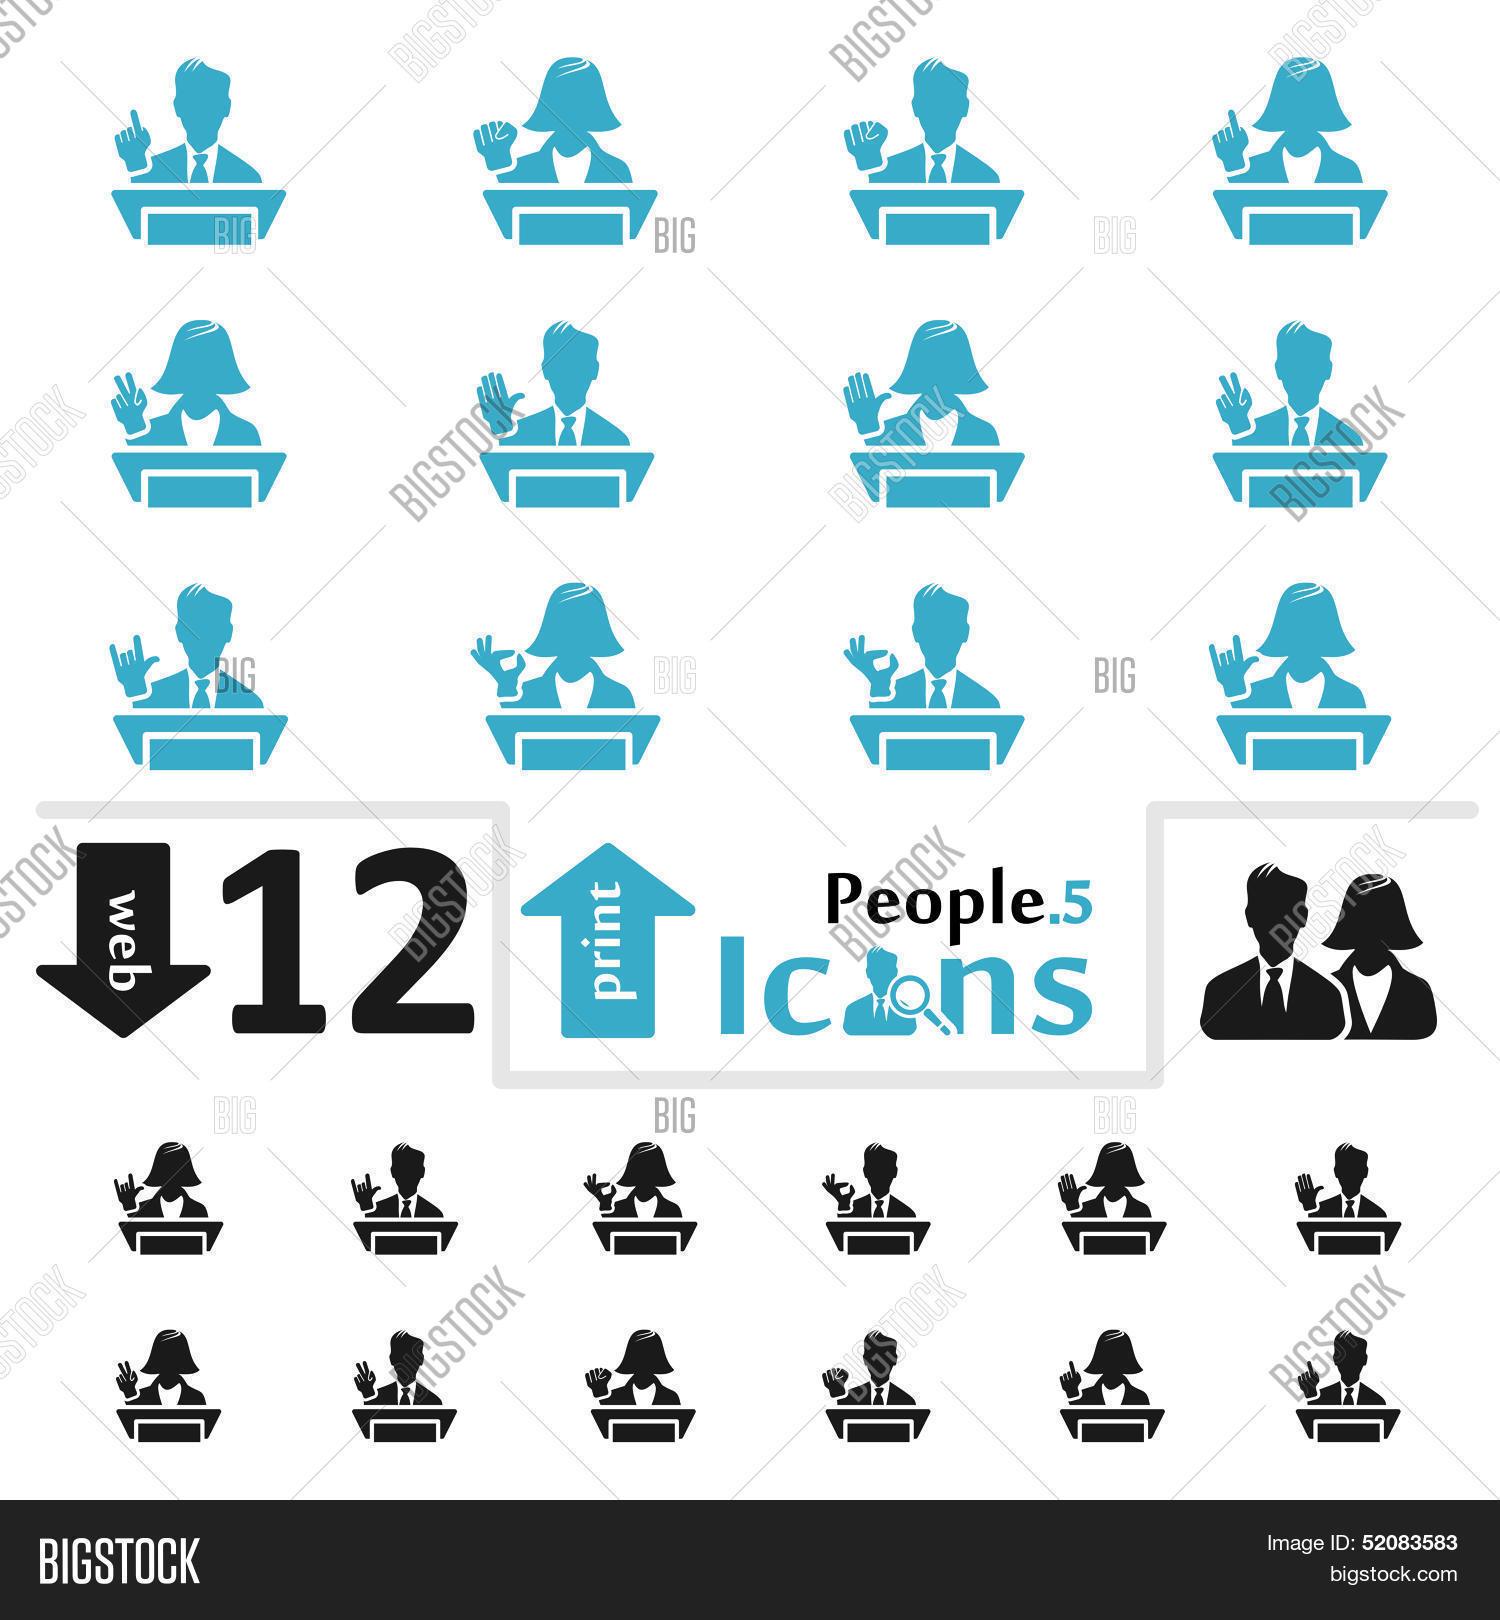 anonymous,avatar,business,businessman,businesswoman,ceo,collection,community,conference,congress,contour,exquisite,fight,figurative,fist,folk,forum,graphic,human,icon,man,management,media,people,pictogram,pictorial,picture,point,portrait,print,profile,representation,resources,rock,set,shape,silhouette,social,society,spokesmen,spokeswoman,stop,symbol,talk,tribune,user,victory,web,woman,workforce